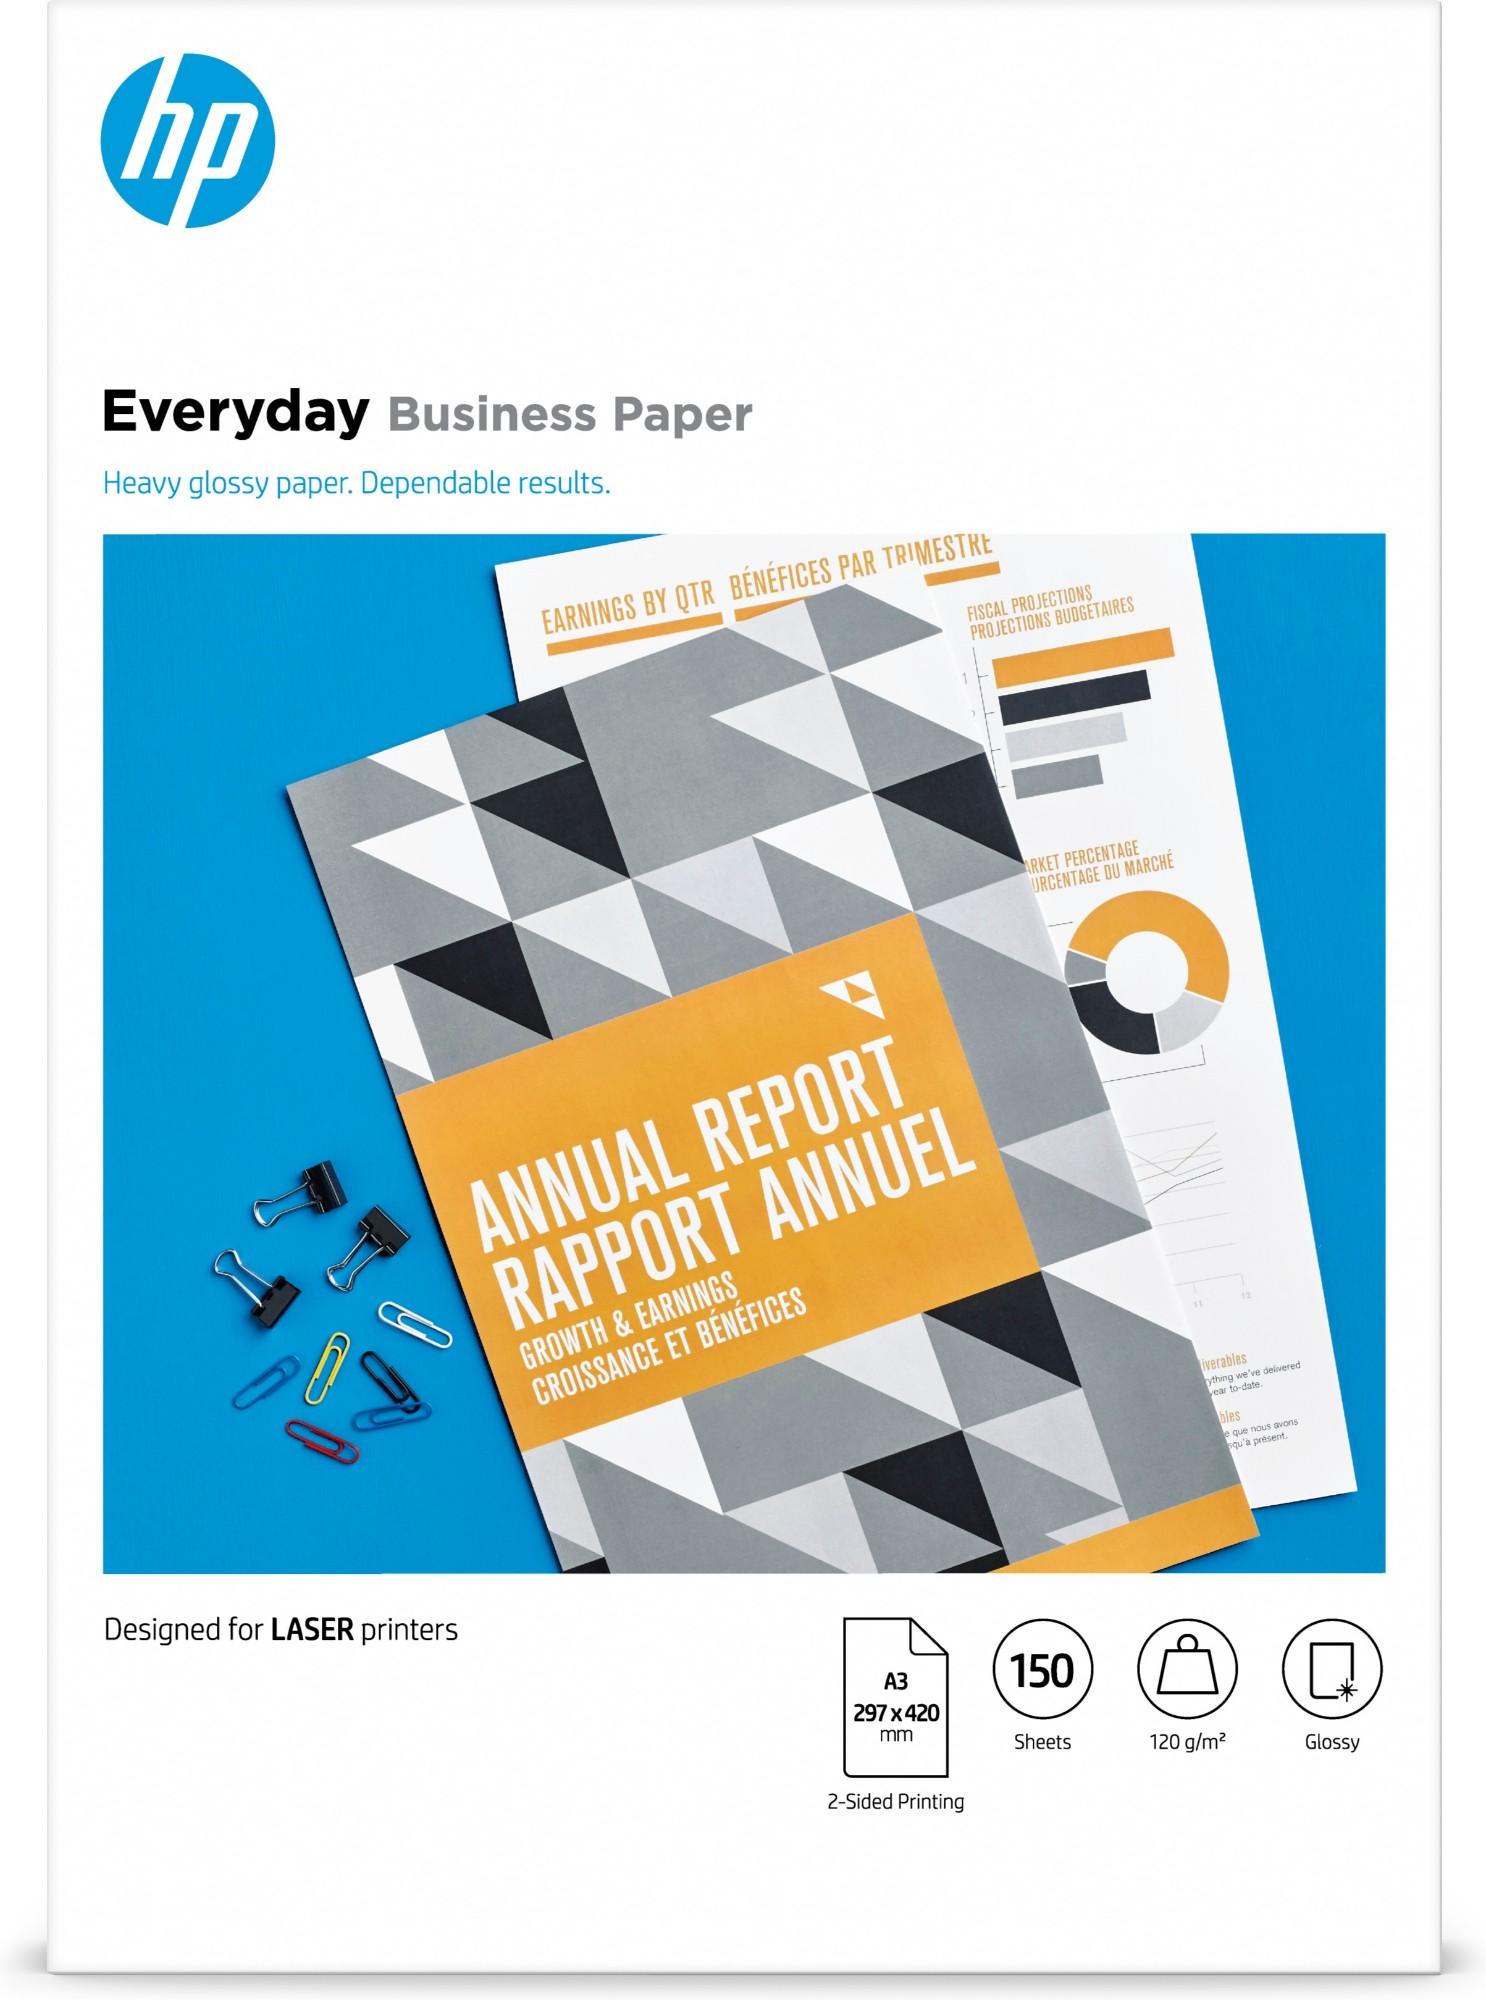 HP 7MV81A printing paper A3 297x420 mm Gloss 150 sheets White